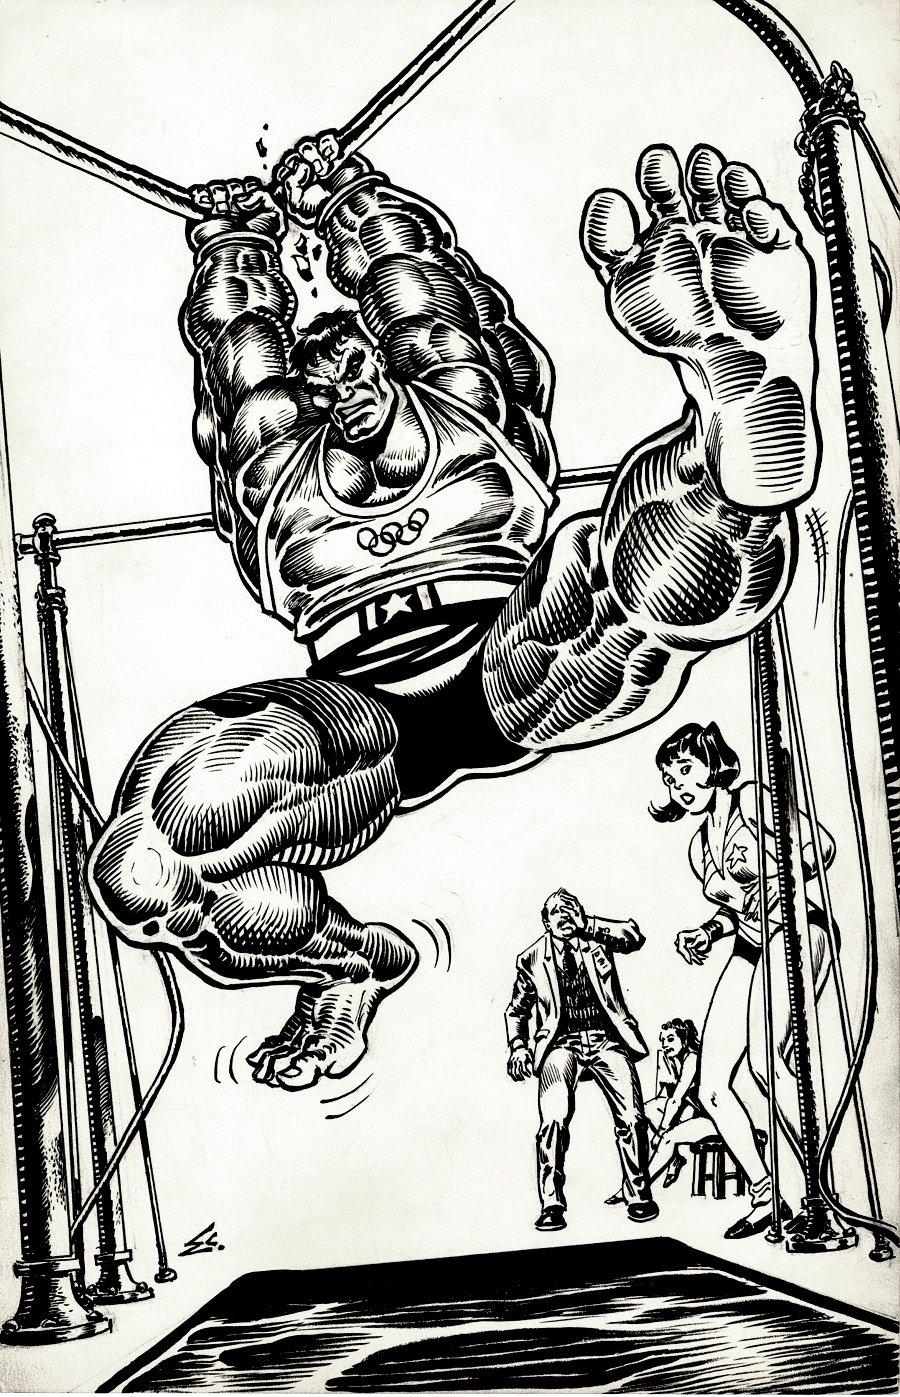 Incredible Hulk Olympics Pinup (1980s)